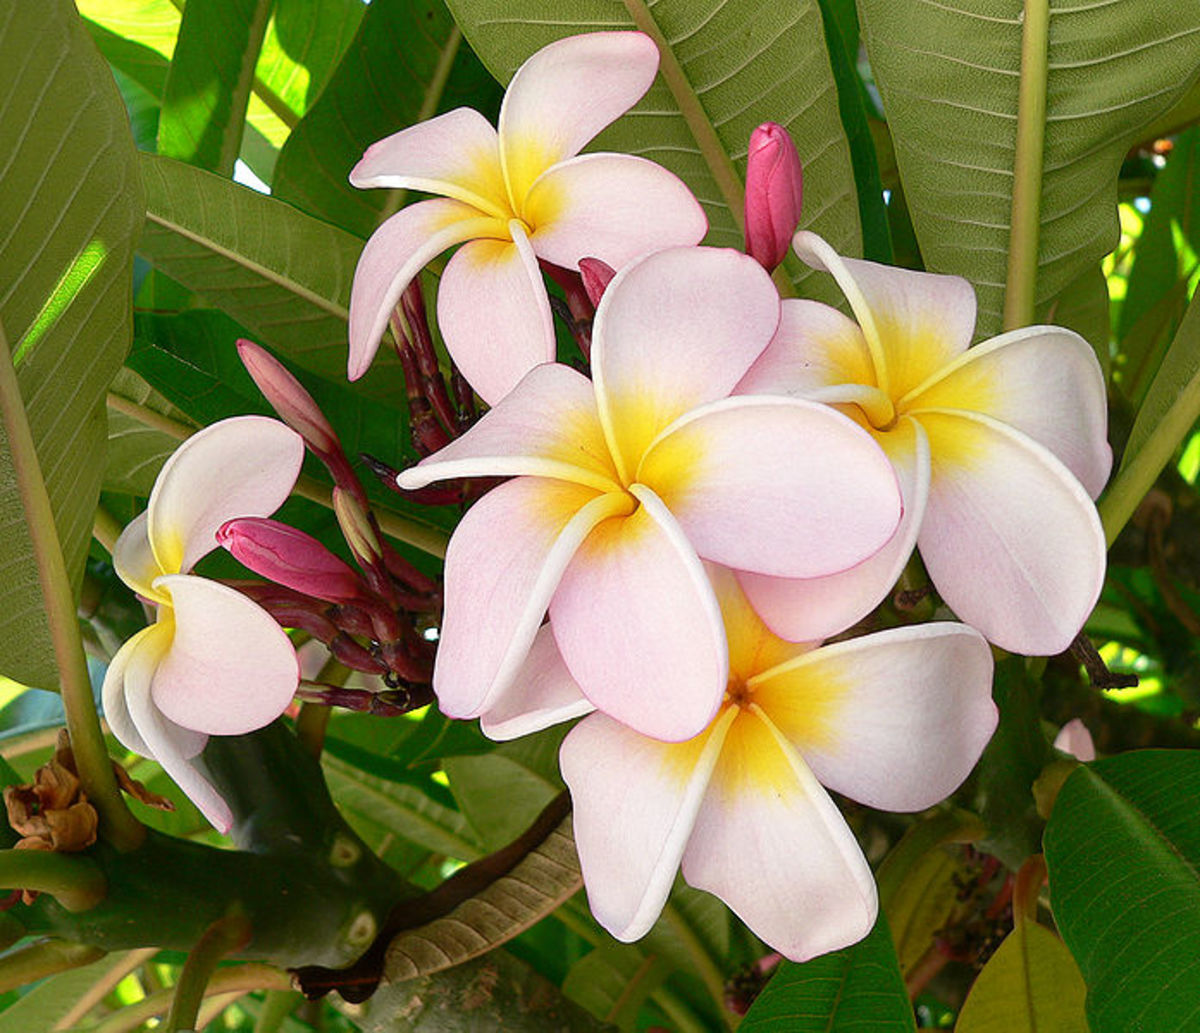 The Frangipani (plumeria) is totally tropical. The flowers of the Frangipani tree evokes the feel of the tropics like no other. .